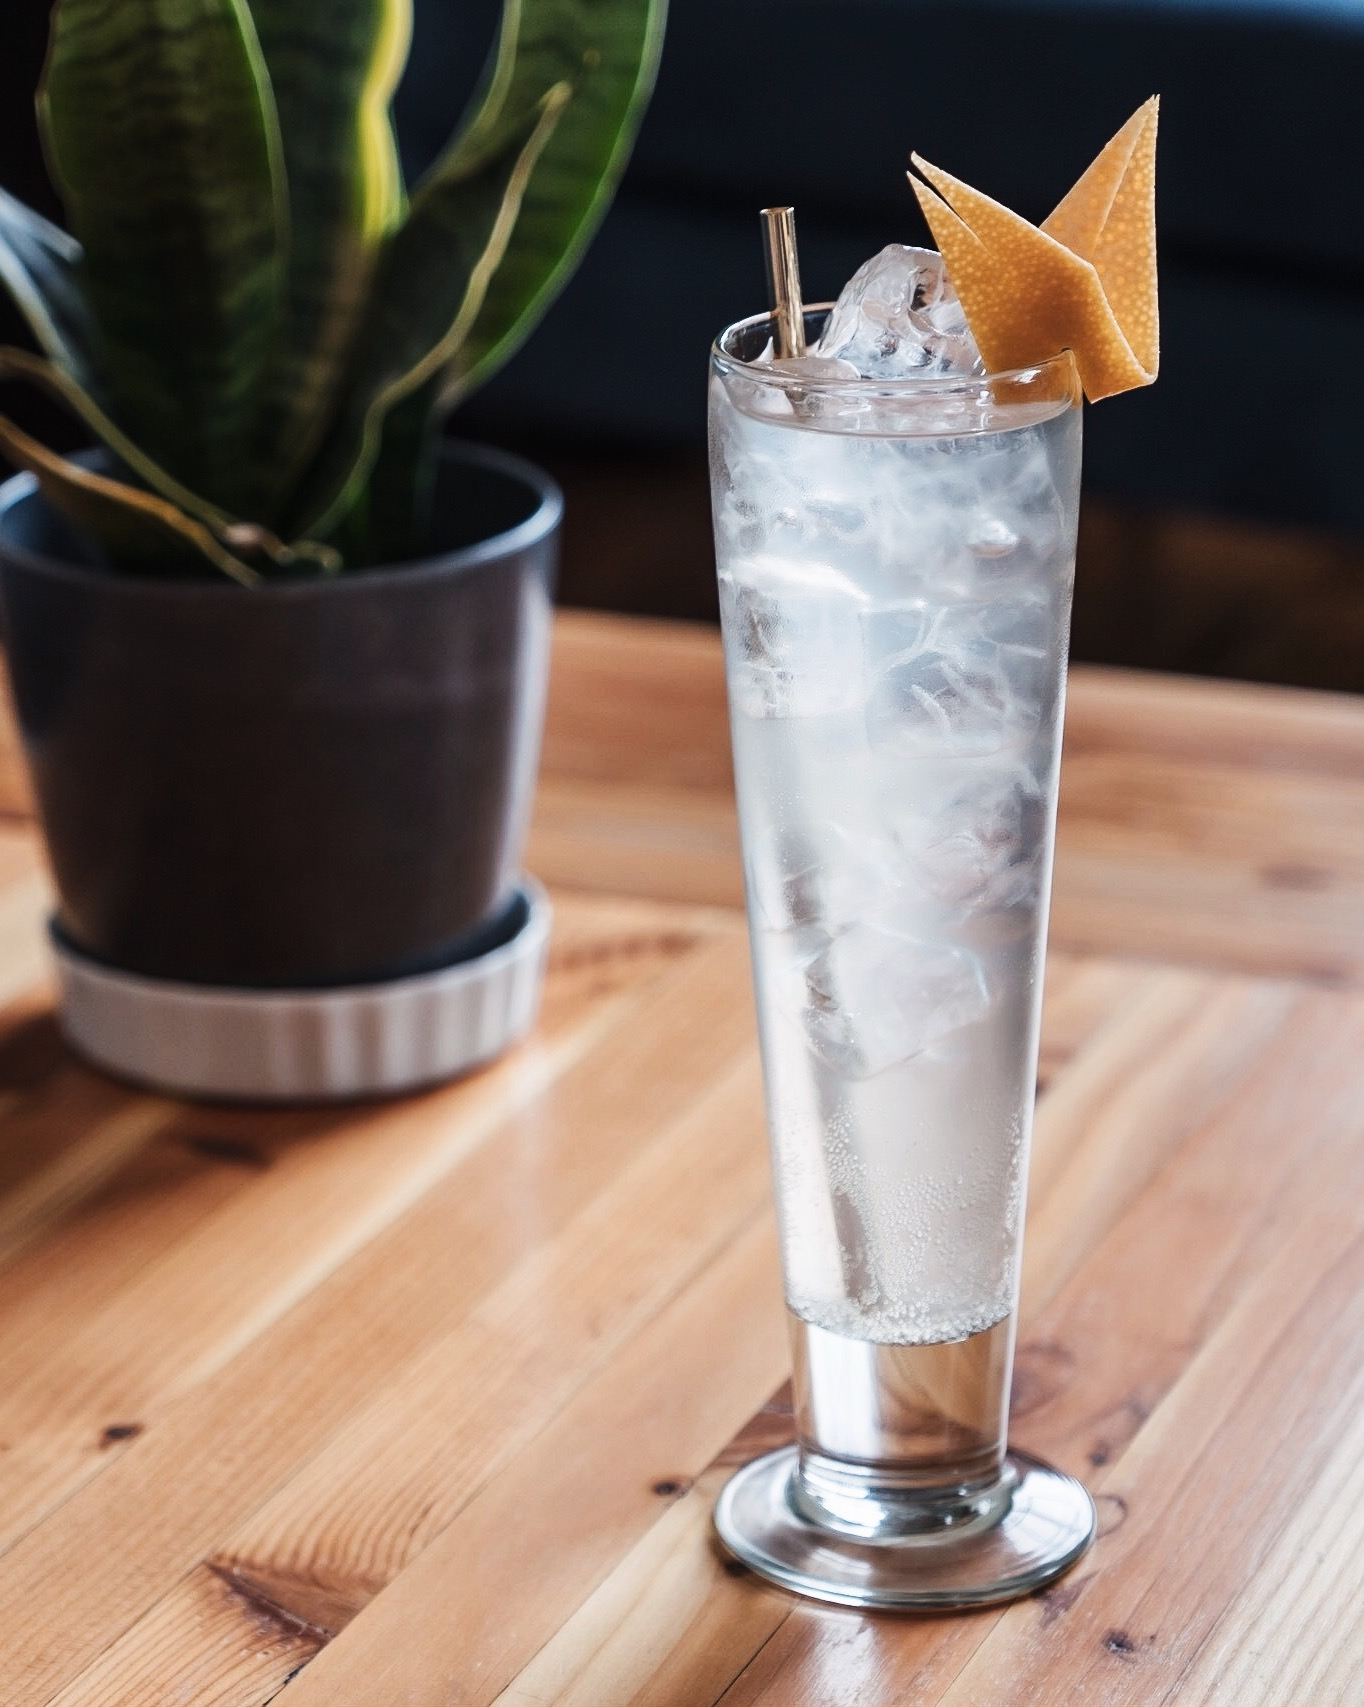 - 1 ½ oz Durango Sotol½ oz Giffard Pamplemousse¾ oz Jalapeño-infused vodka½ oz Sage simple syrupGrapefruit sparkling water